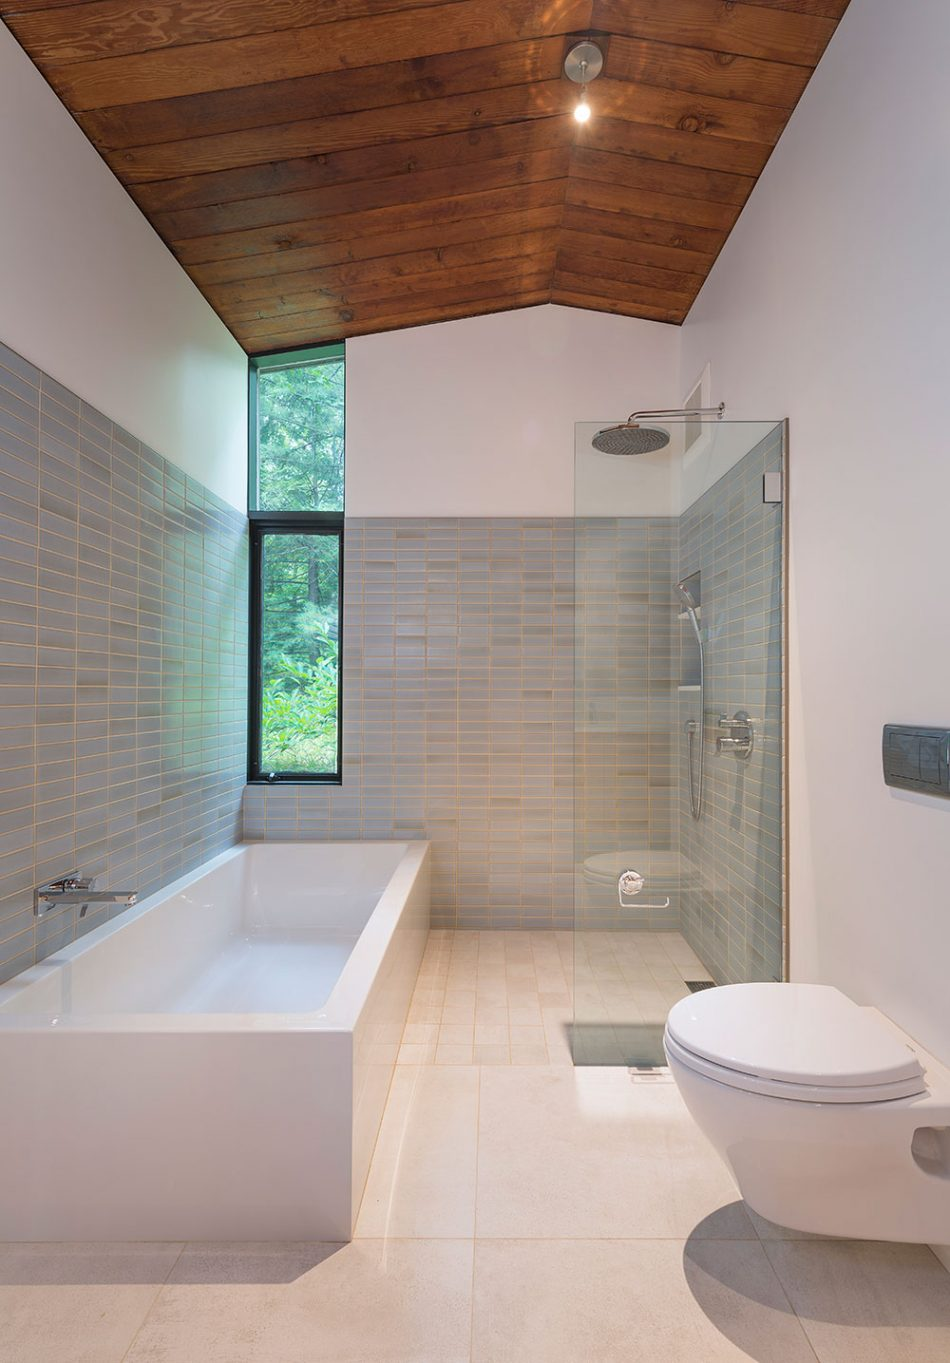 modern bathroom interior with wood ceiling